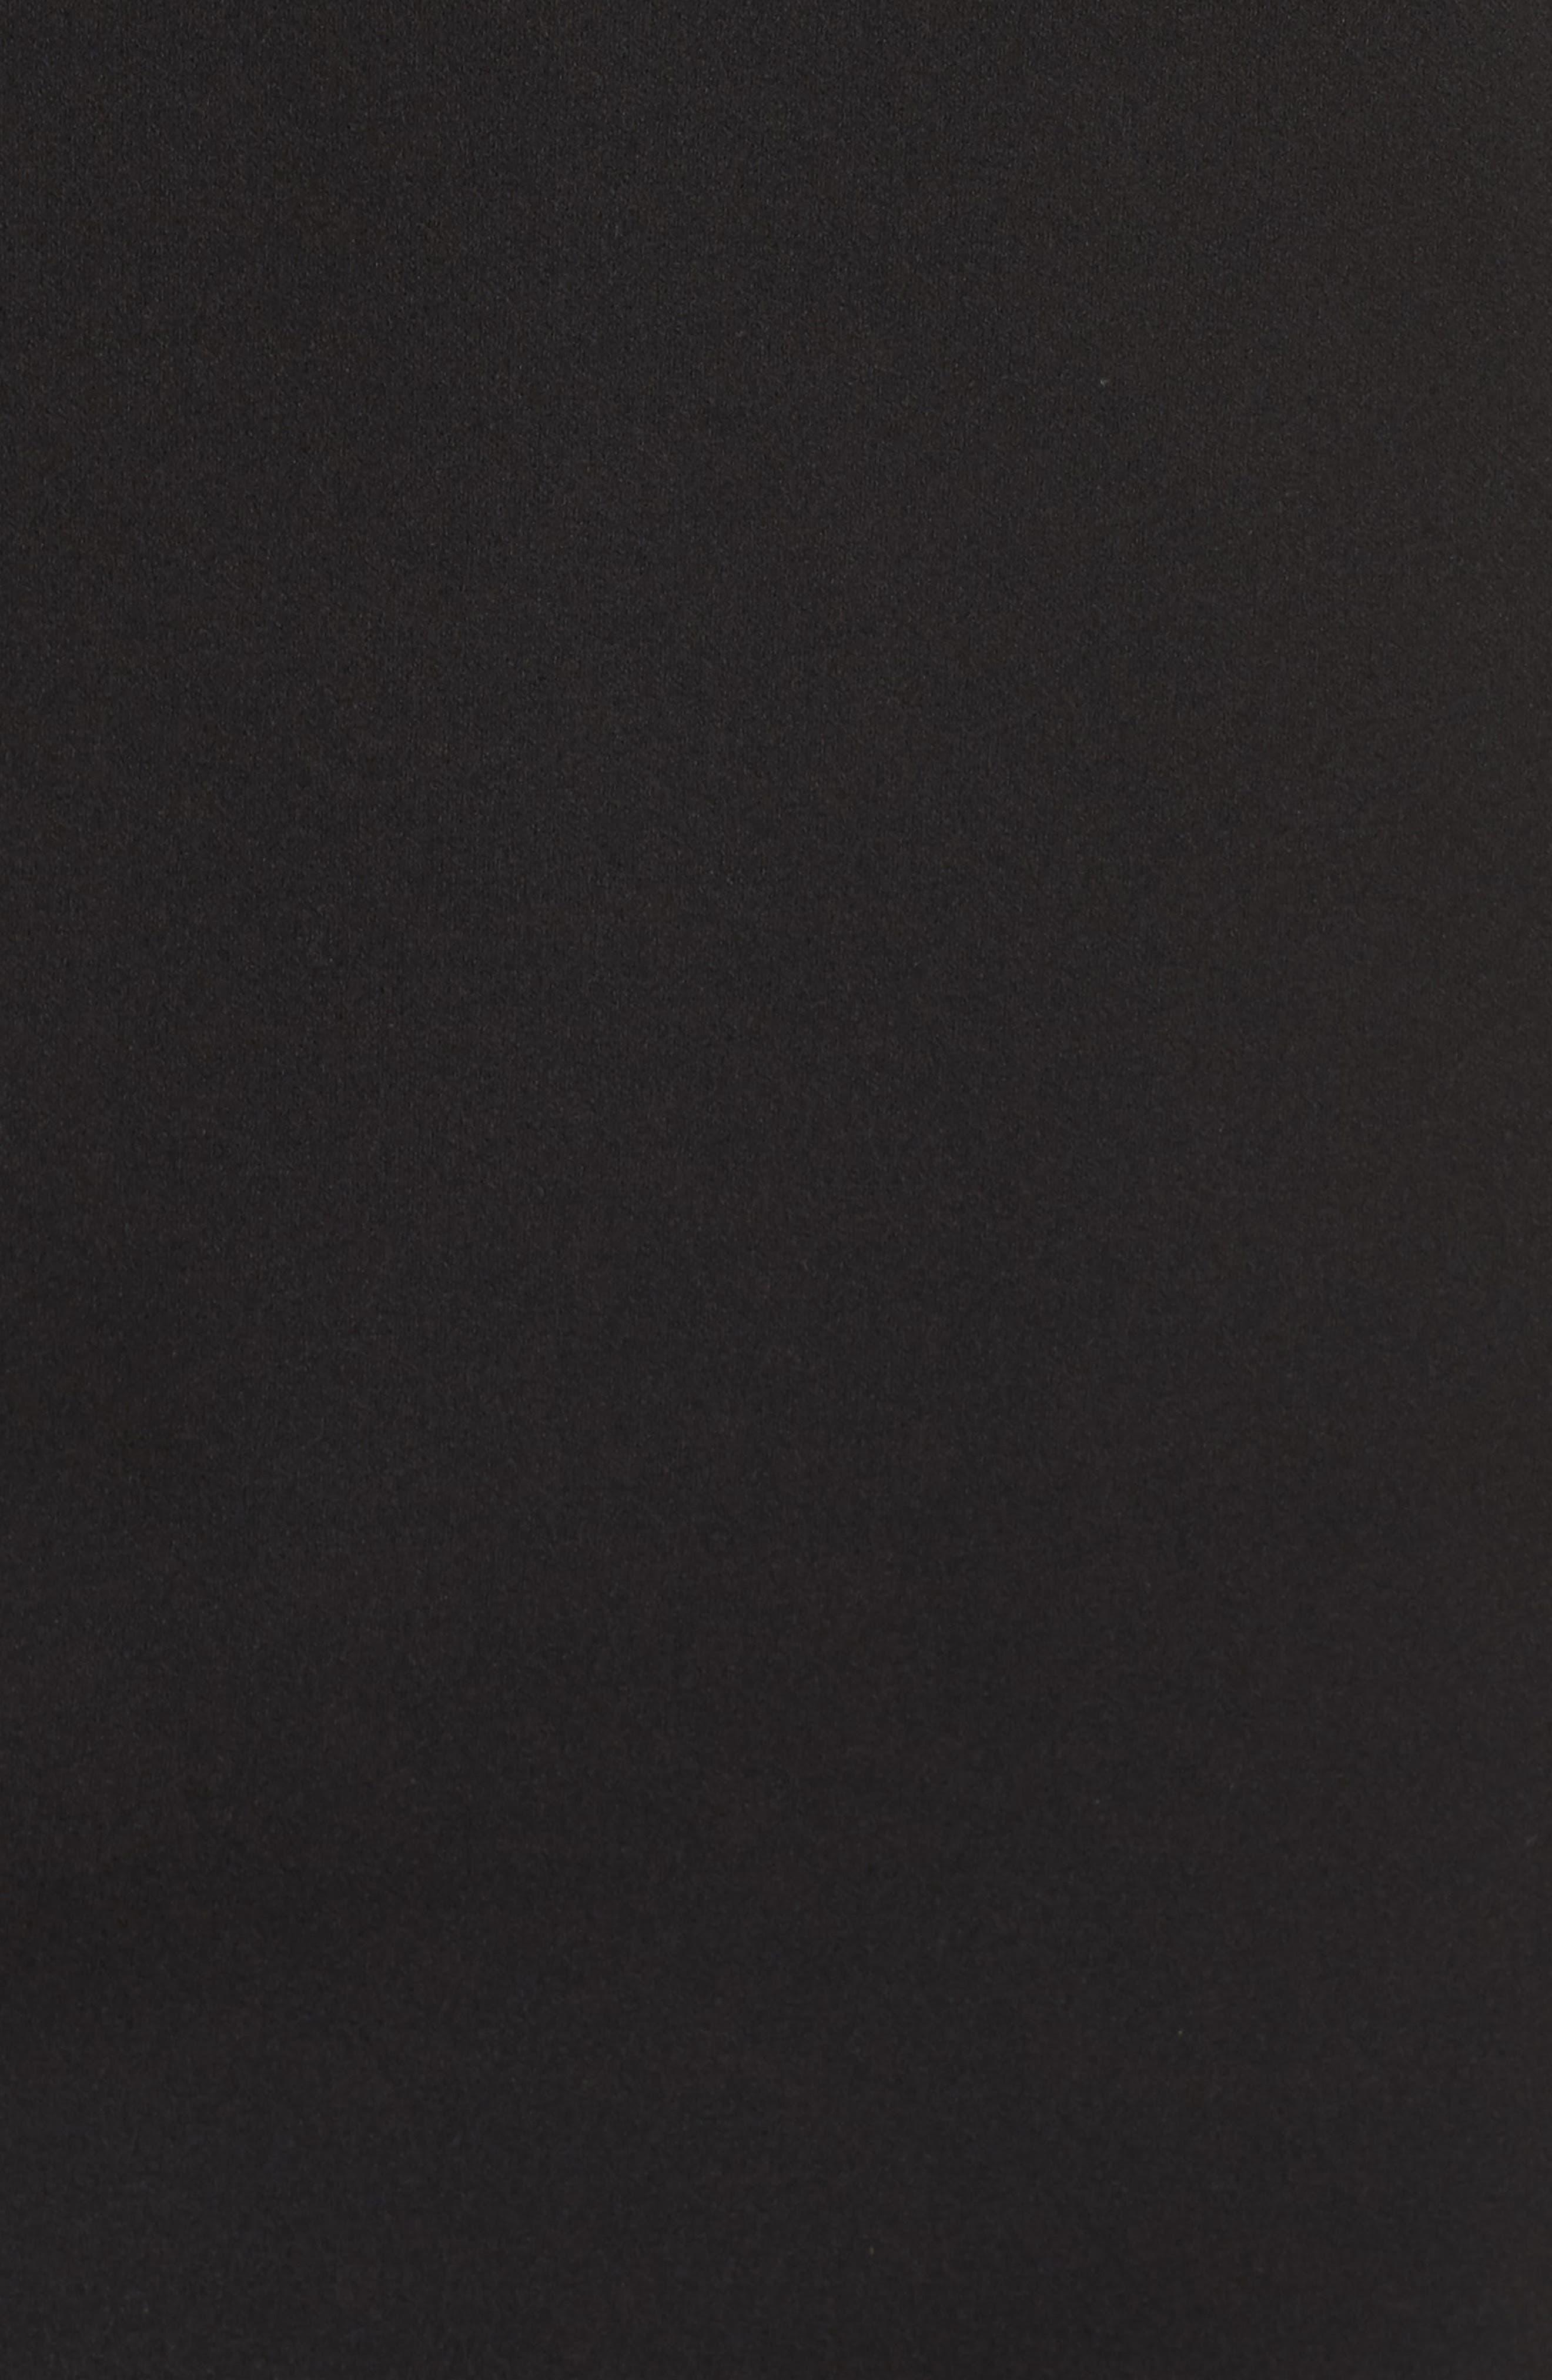 Off the Shoulder Sheath Dress,                             Alternate thumbnail 6, color,                             BLACK